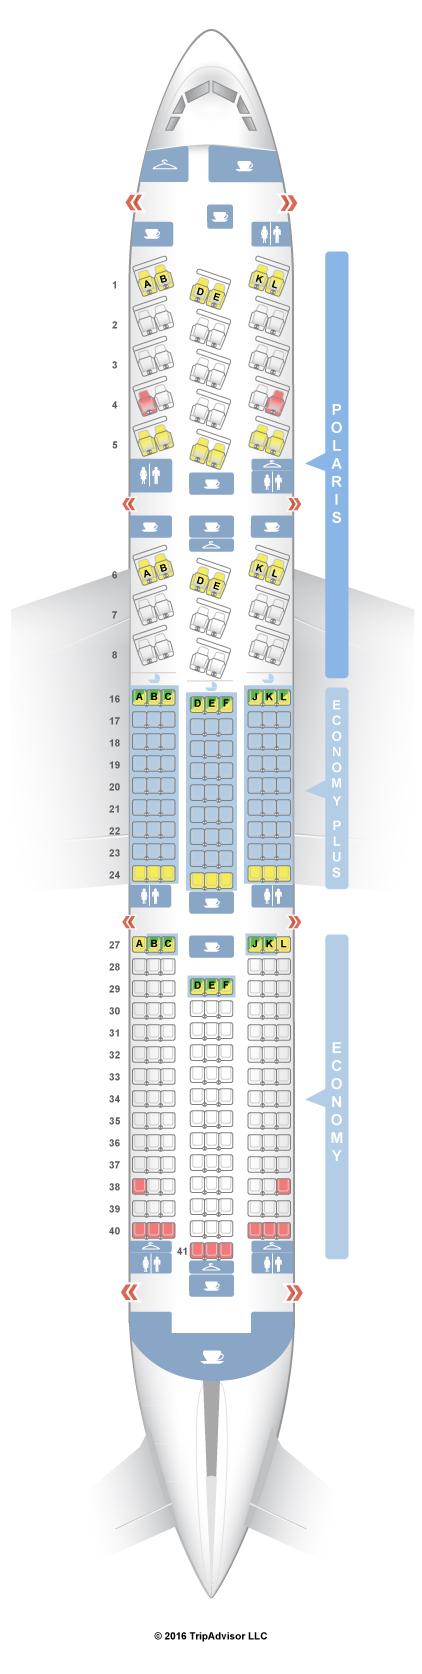 788 8 lot dreamliner seating chart wiring diagrams